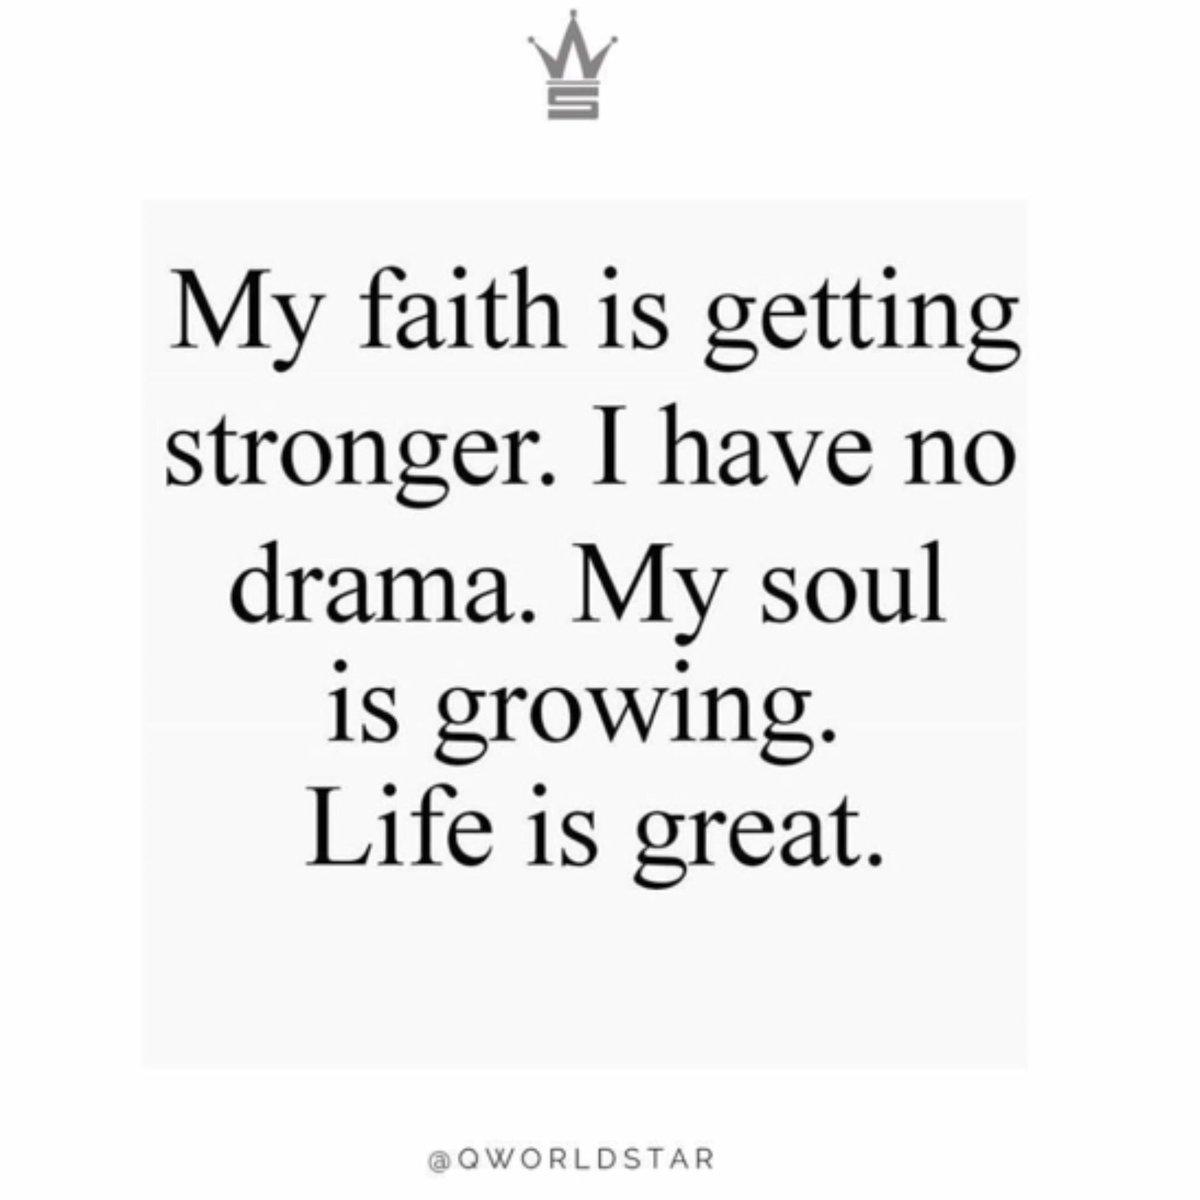 """Mood...keep evolving...never let the BS & negativity weigh you down!""   @QWorldstar #PositiveVibes <br>http://pic.twitter.com/JZwuvOCSP1"